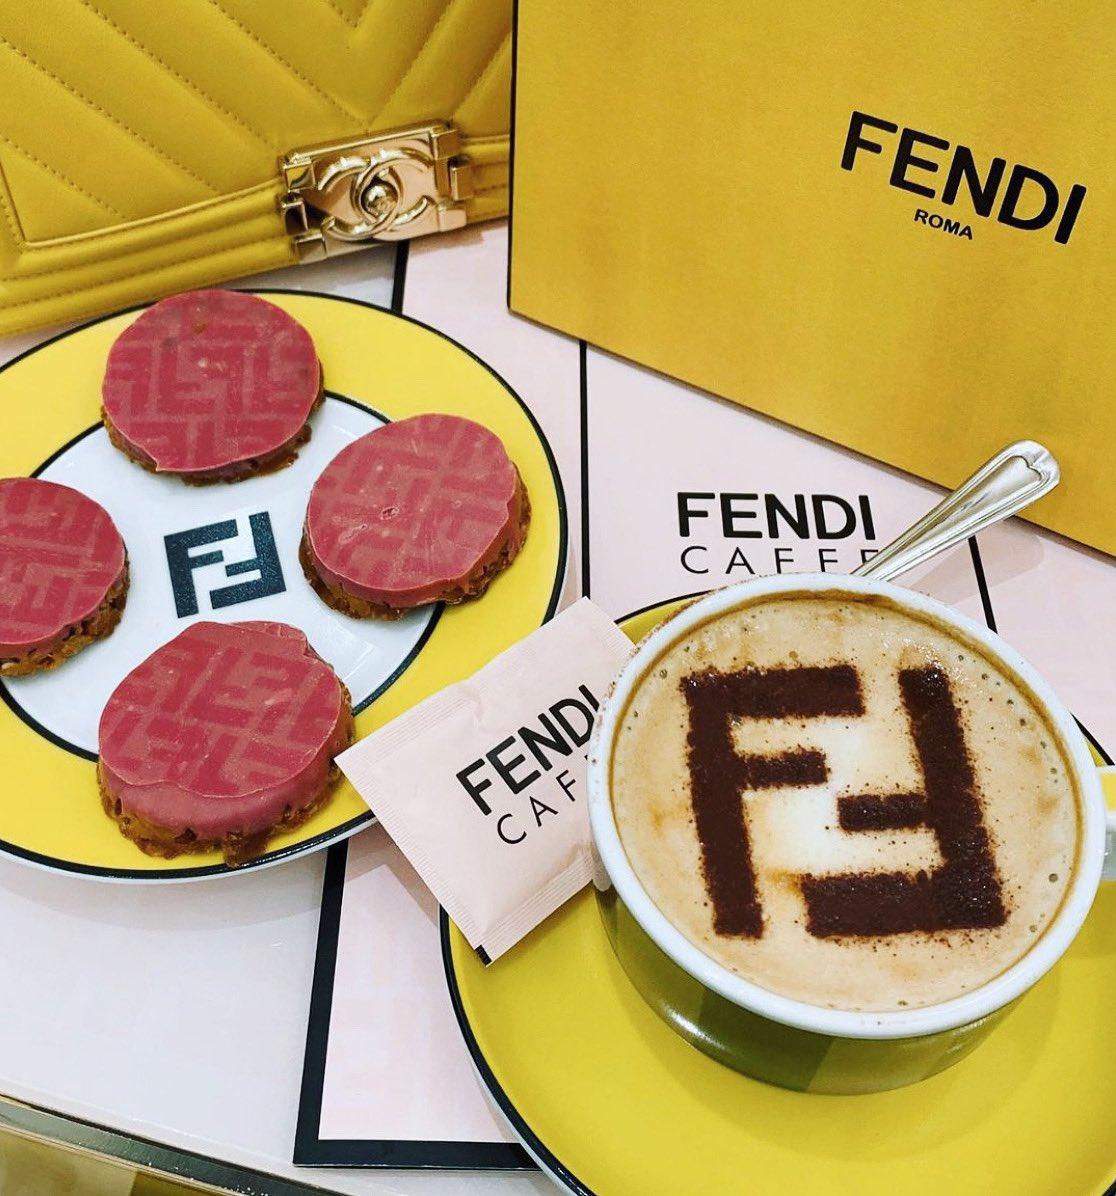 Morning coffee fix with my girls💕 #fendi  #fashion #coffeetime #cool